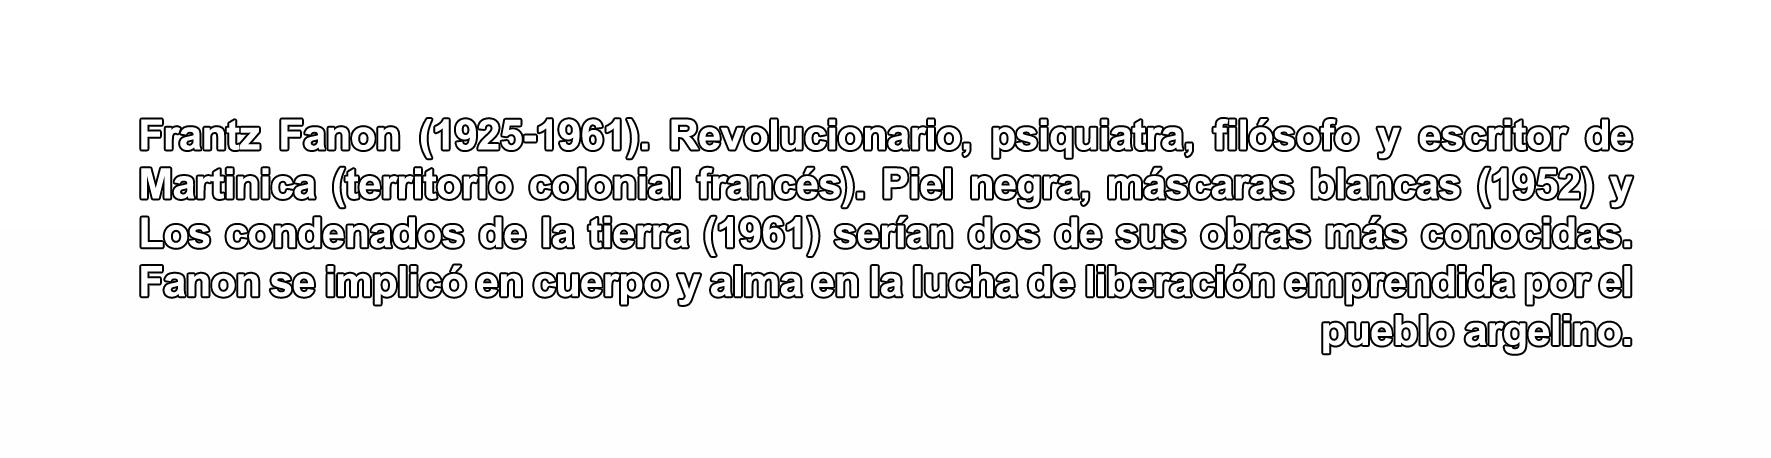 Frantz Fanon (1925-1961). Revolucionario.  epc